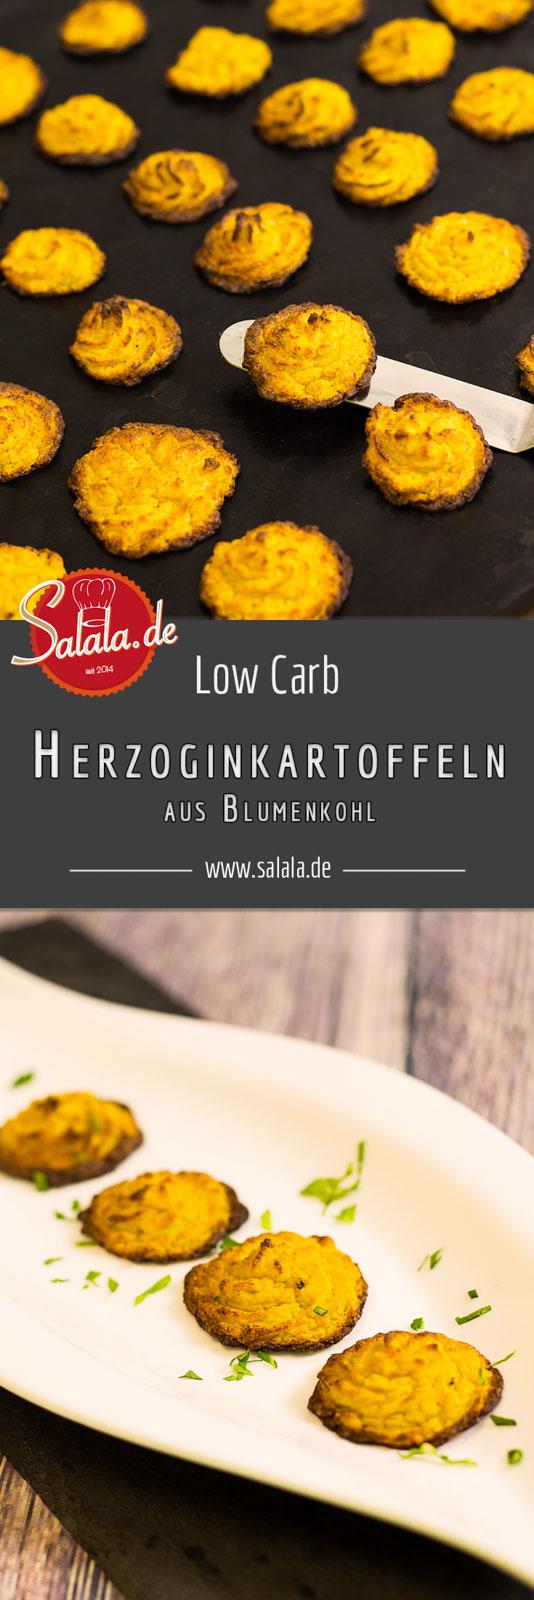 Herzoginkartoffeln ohne Kohlenhydrate Low Carb Rezept mit Blumenkohl Low Carb Herzoginkartoffeln - by salala.de - Blumenkohl Kartoffeln Ofengericht glutenfrei ohne Mehl